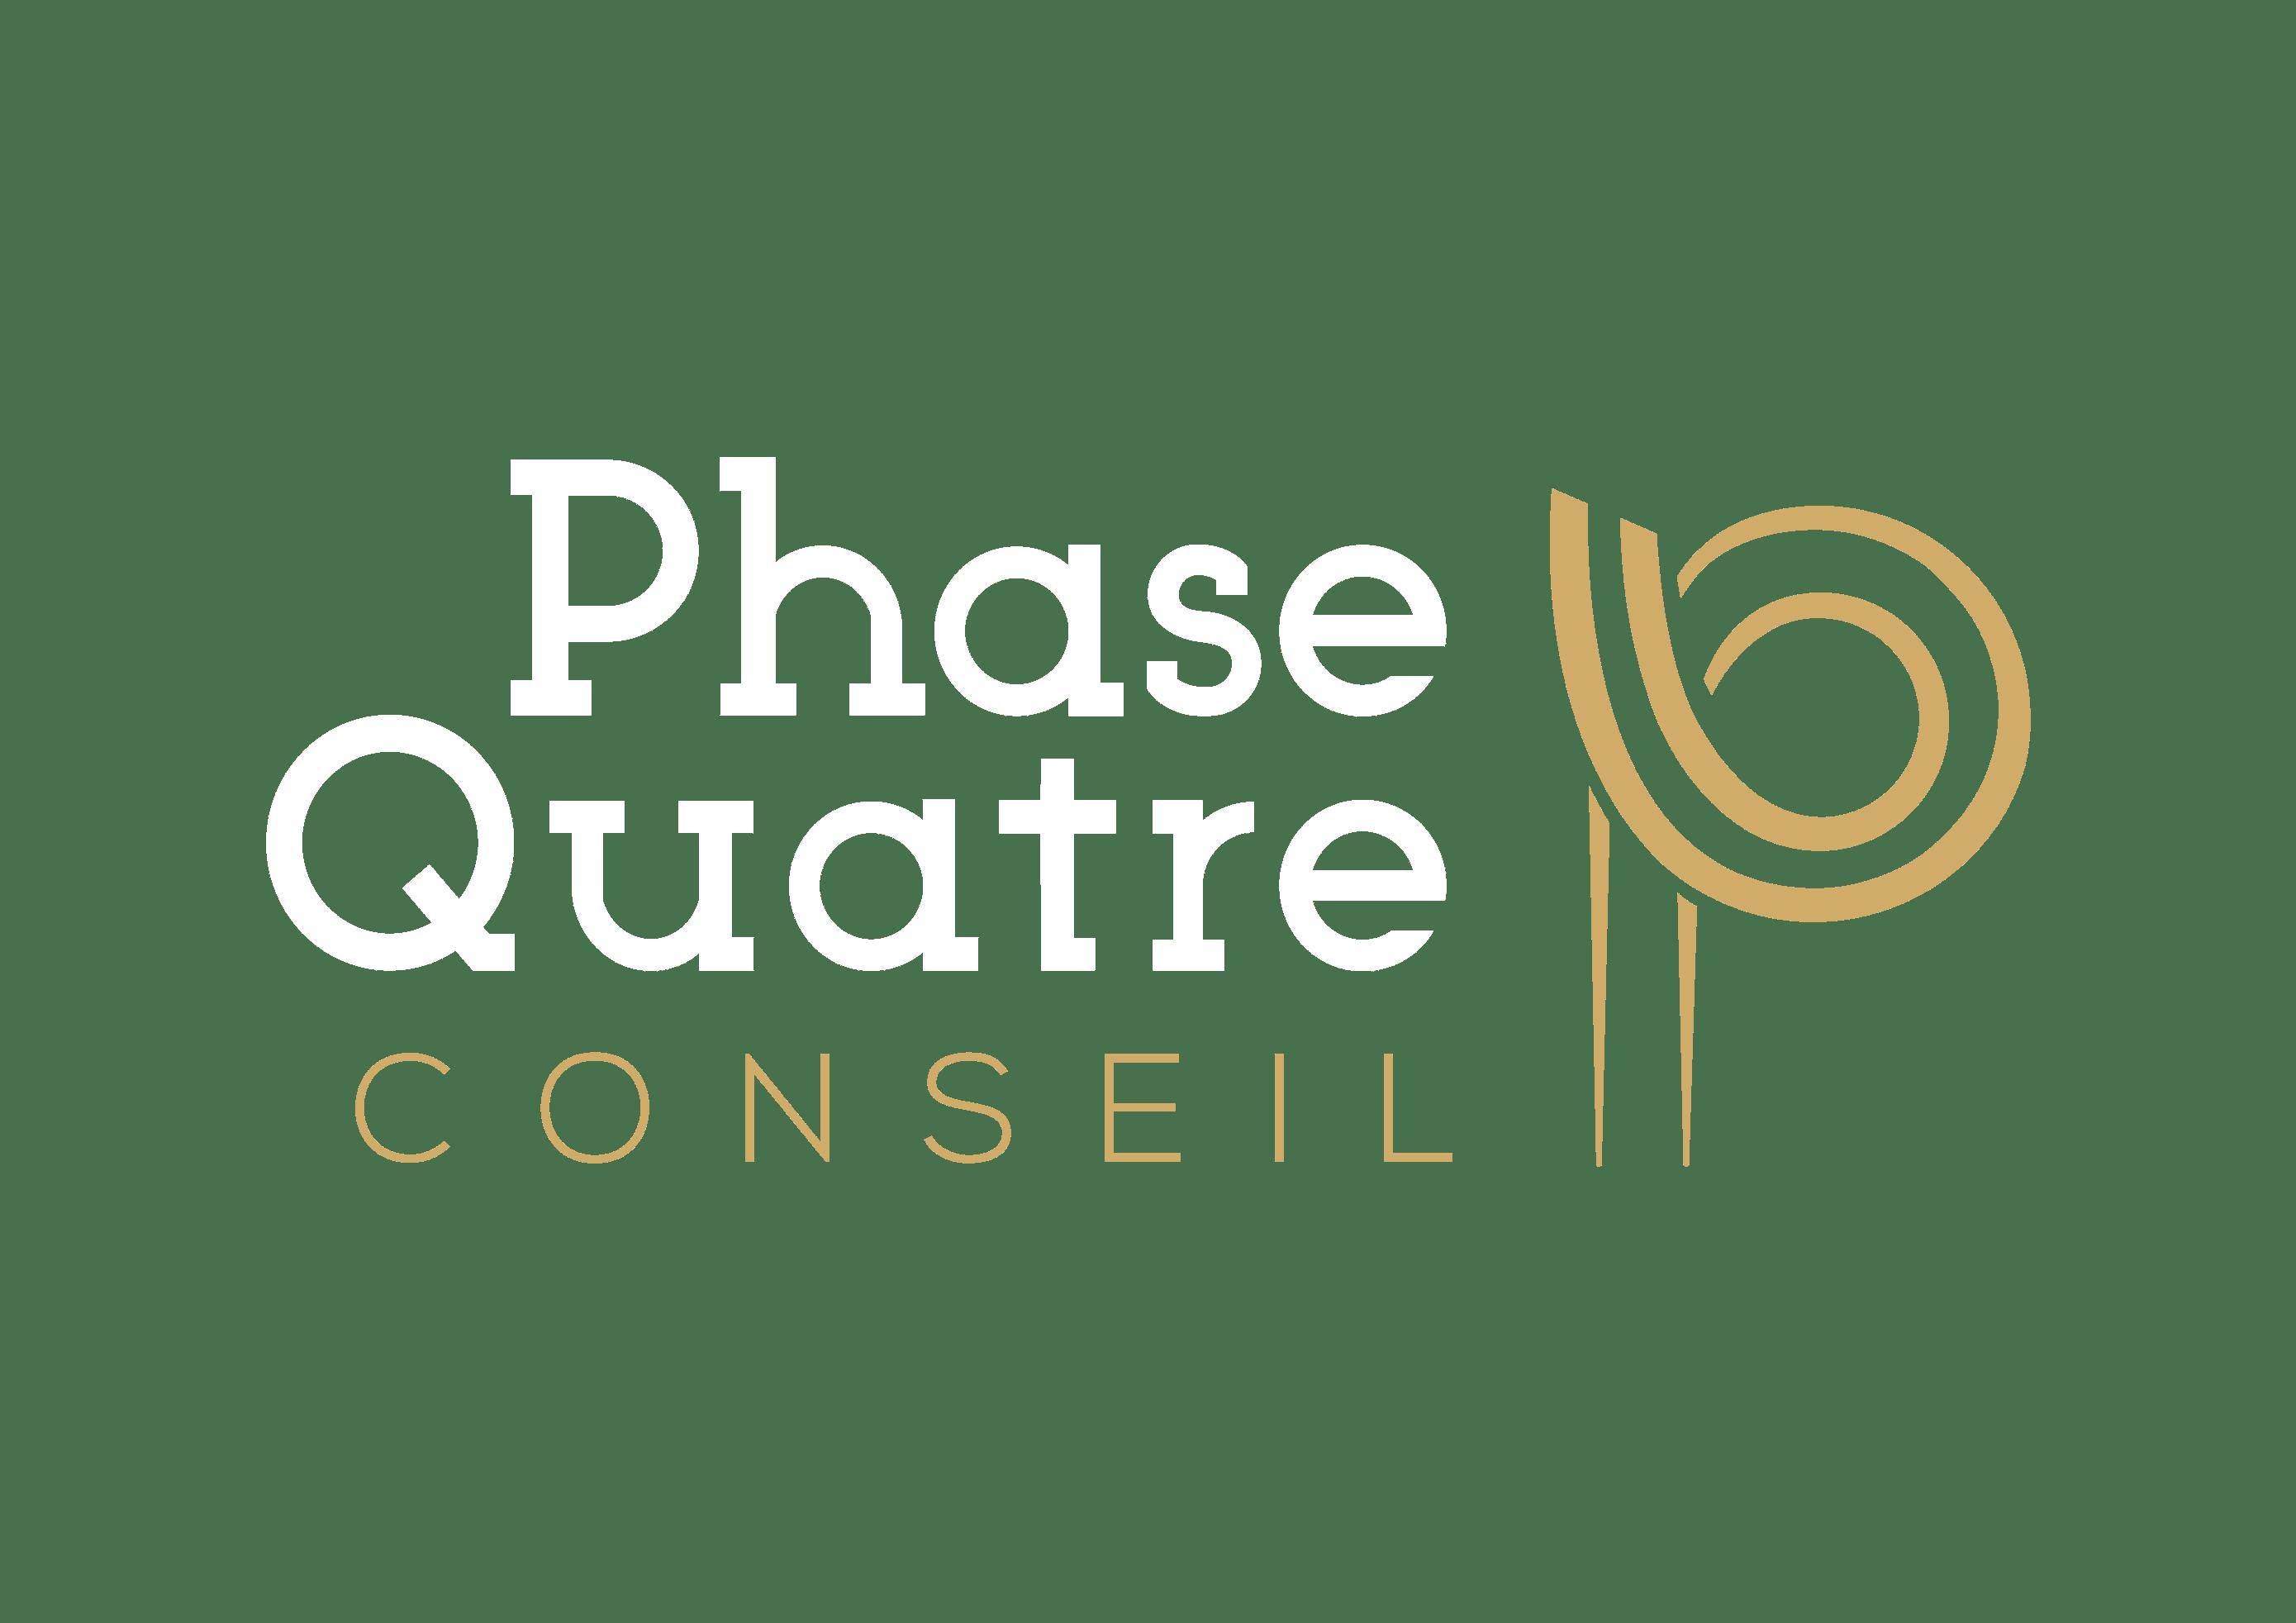 Phase 4 Conseil